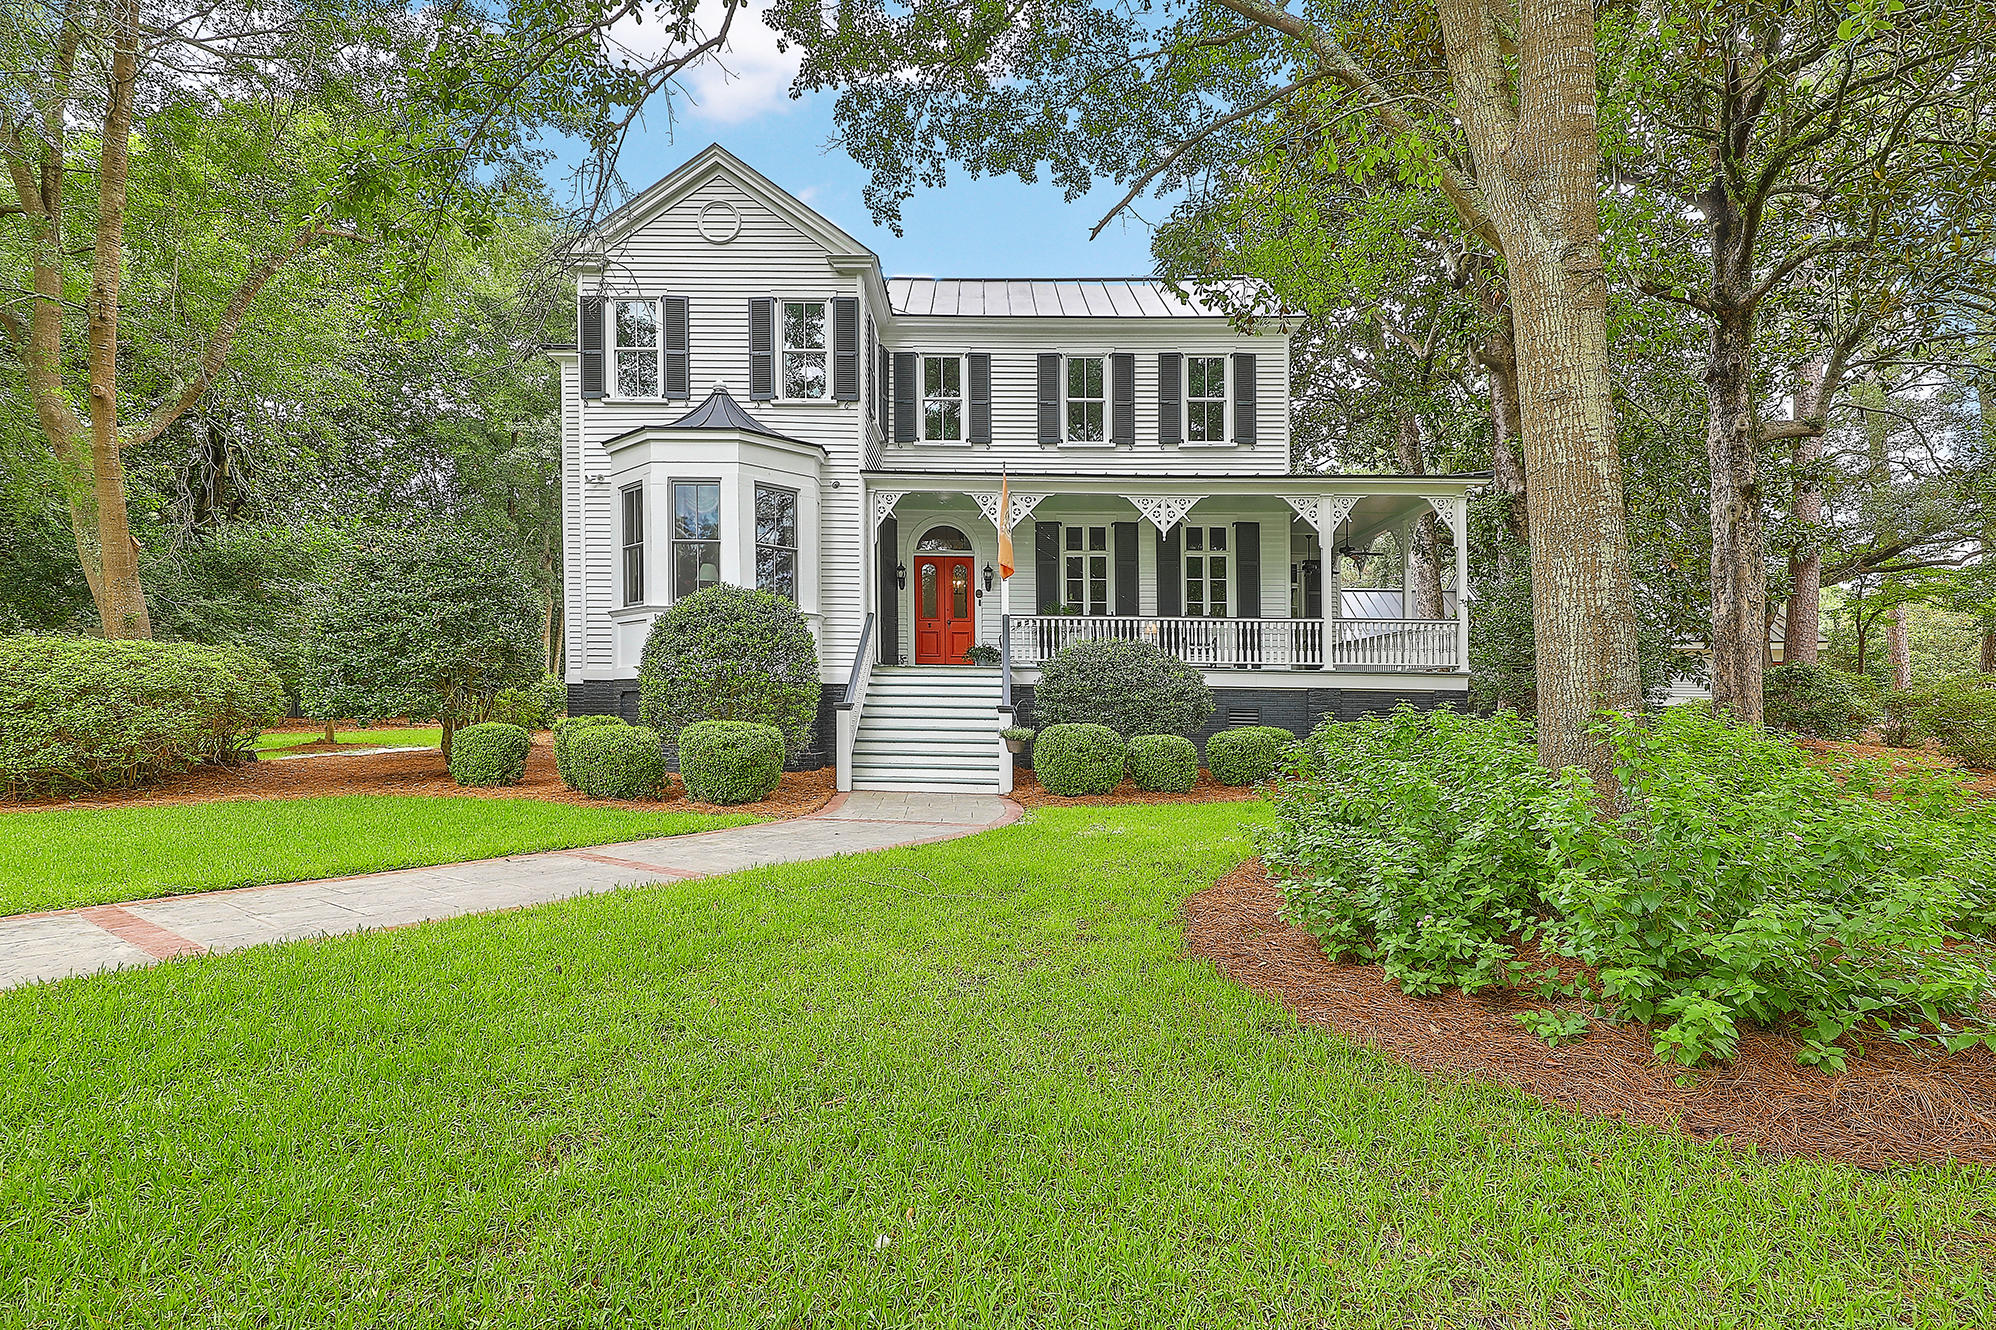 Summerville Homes For Sale - 102 Hickory, Summerville, SC - 27